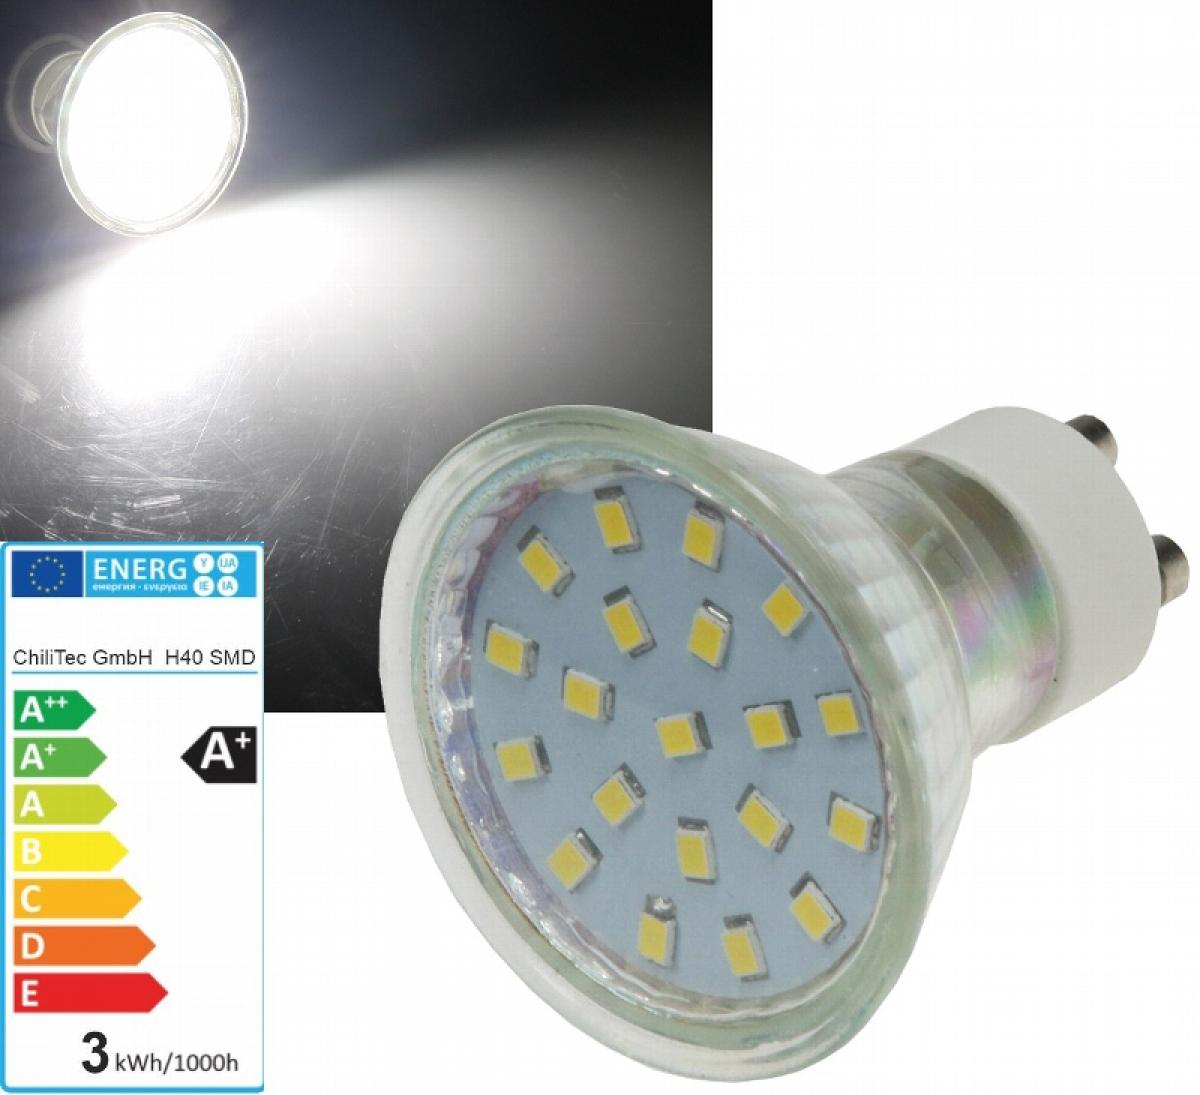 LED Strahler Leuchtmittel GU10 230V 3W neutralweiß 4000k 300lm EEK ...